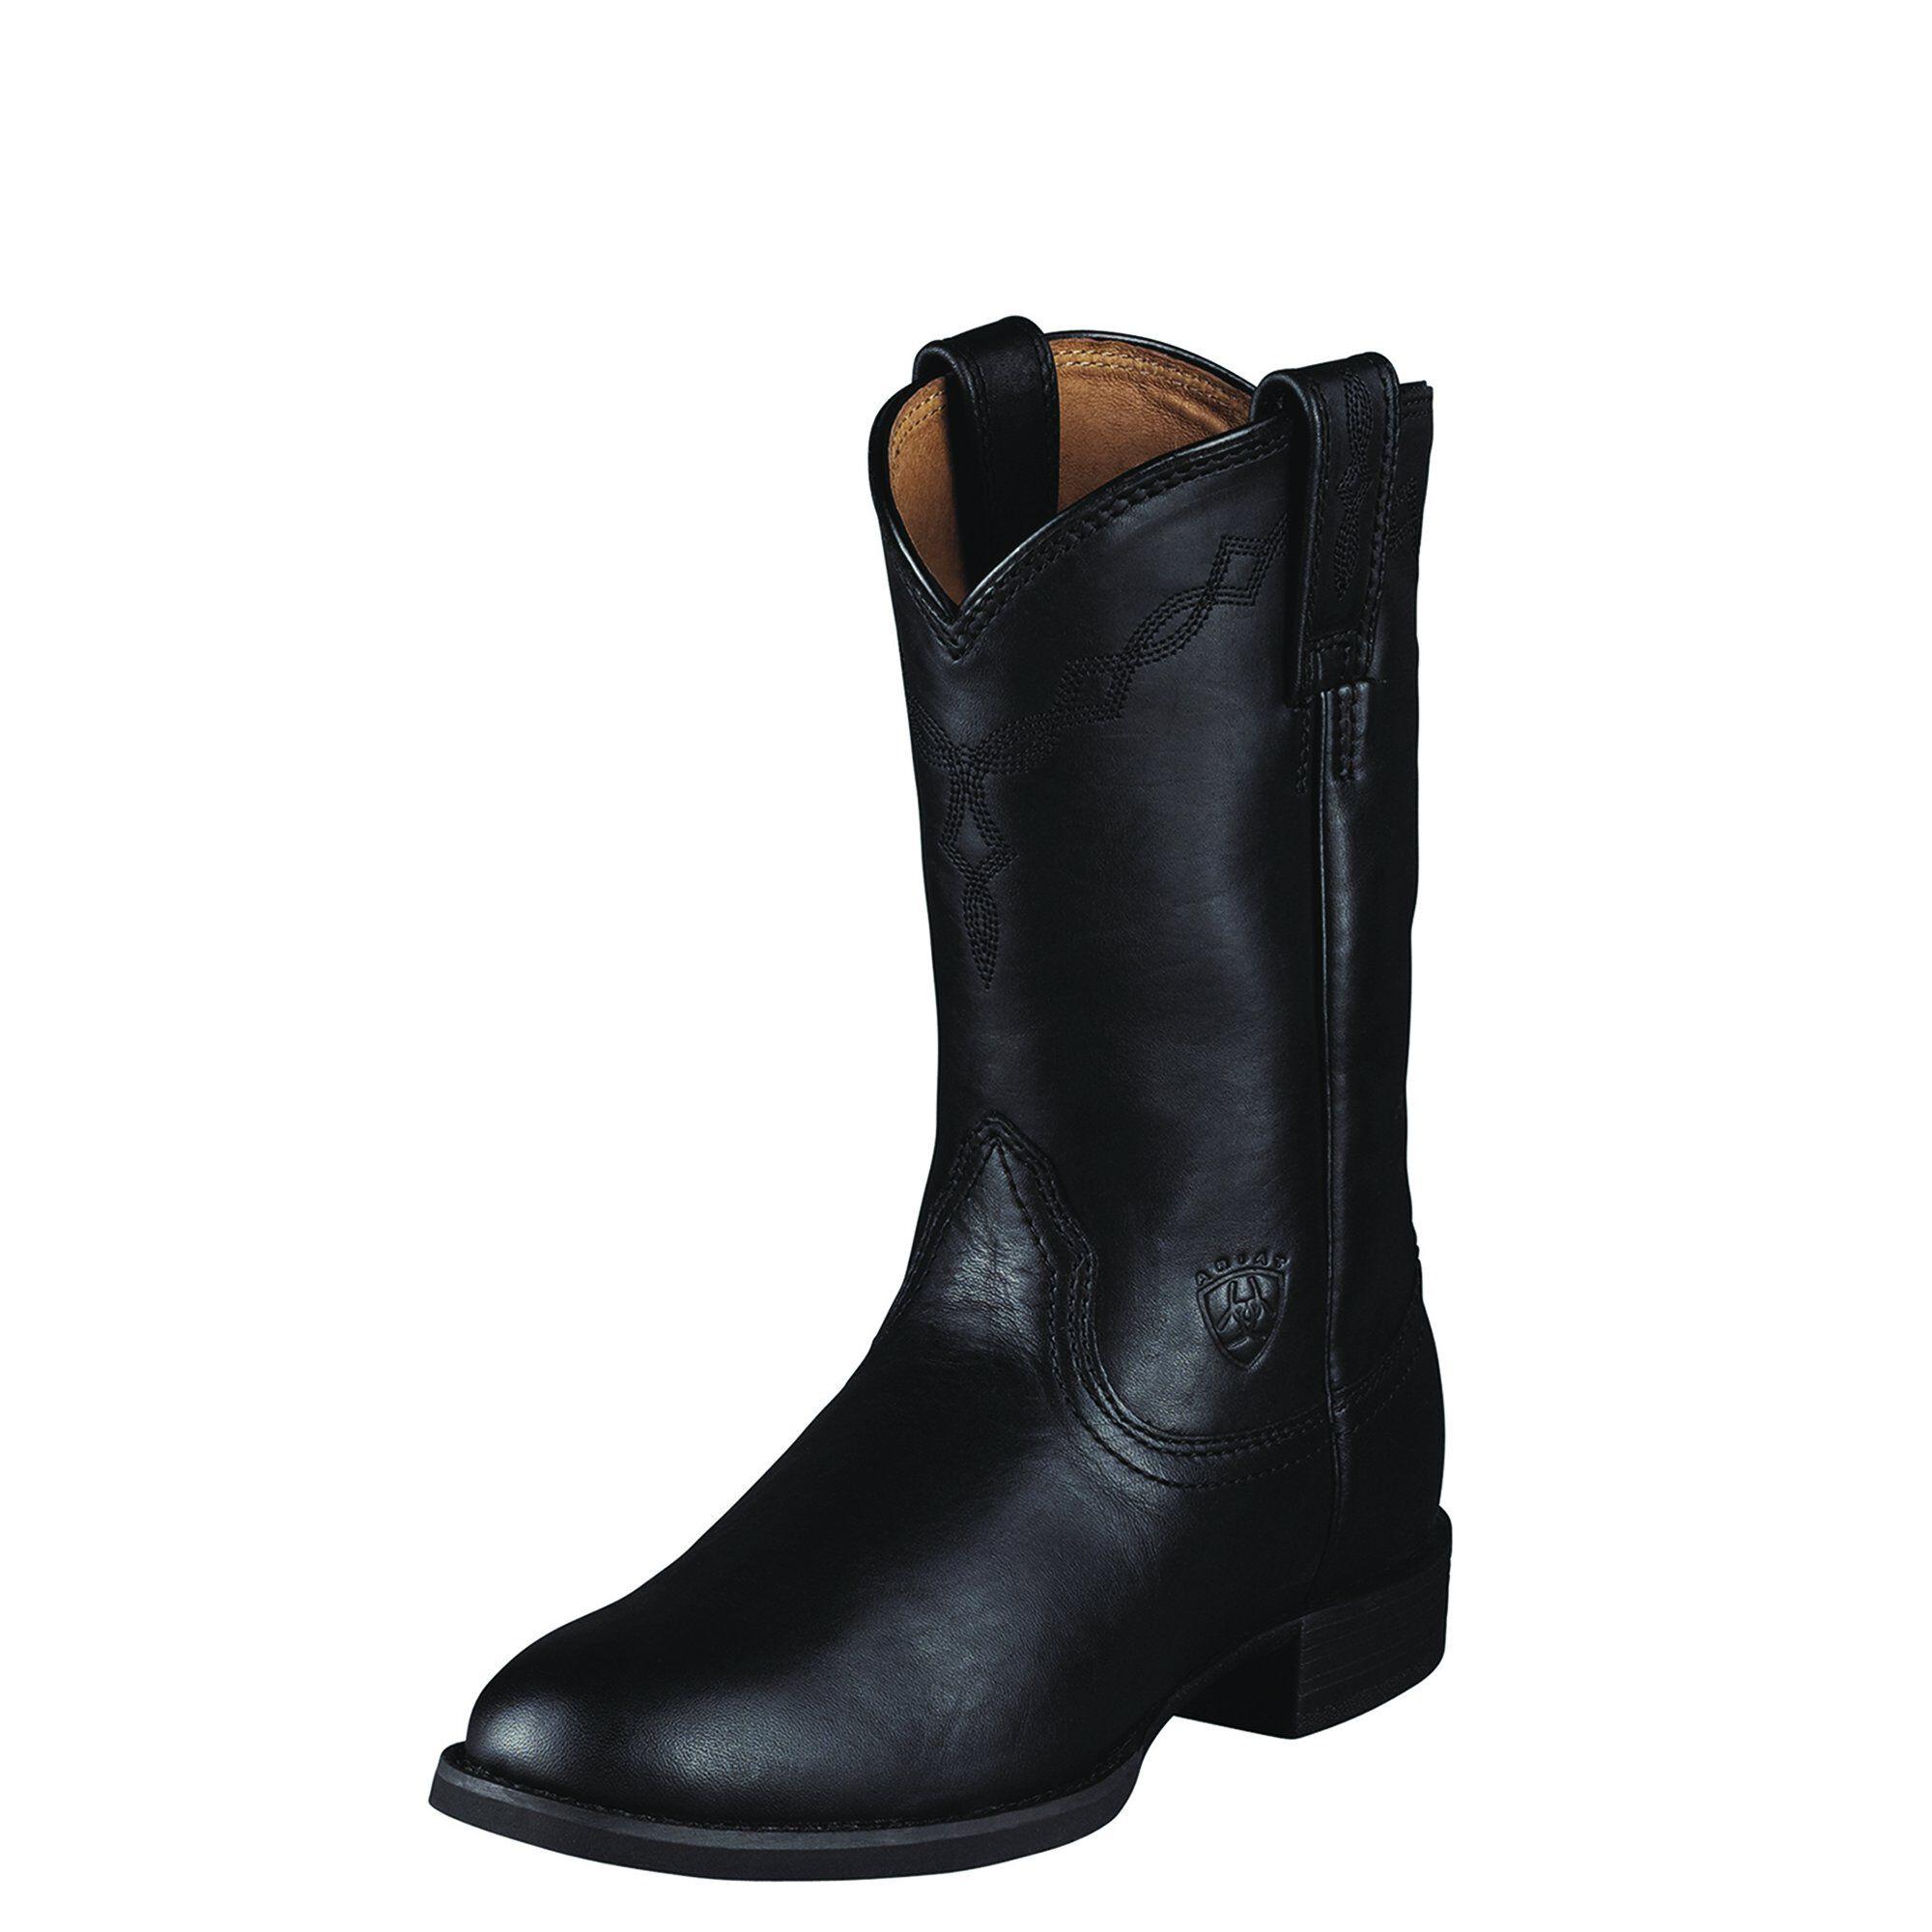 Heritage Roper Western Boot | Ariat